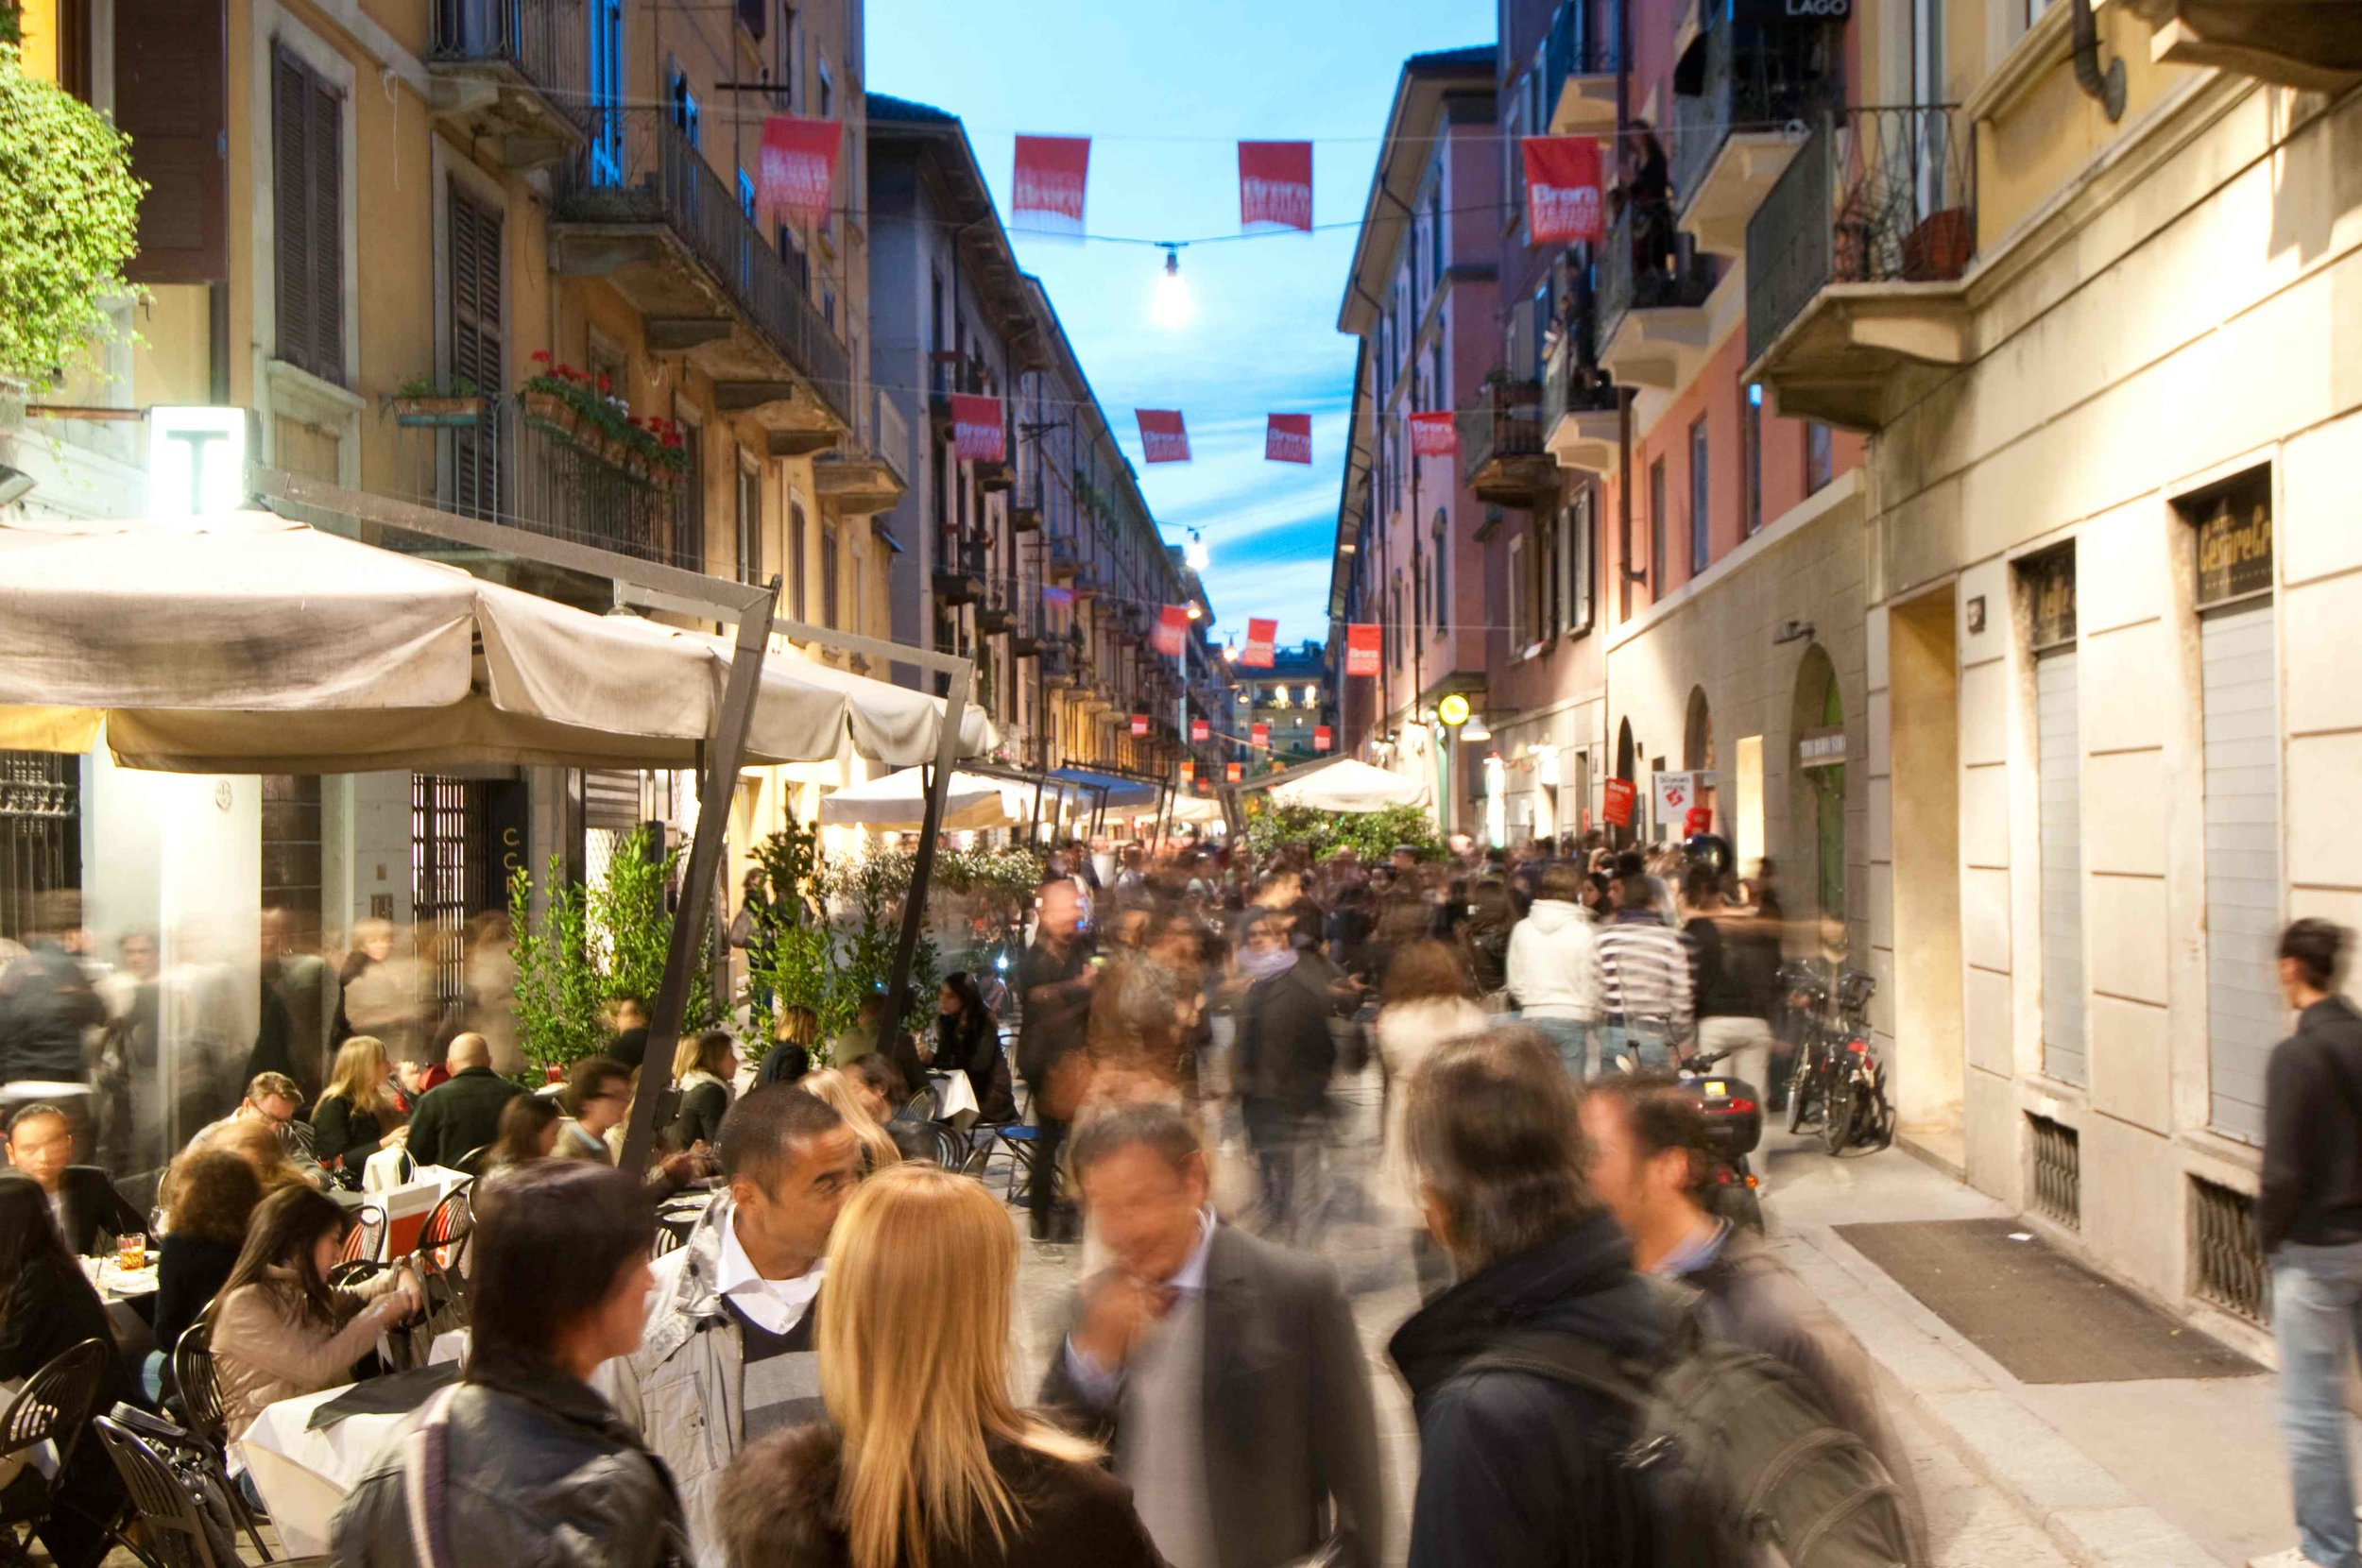 Brera District Milan  Photo Credit: milancitytour.com